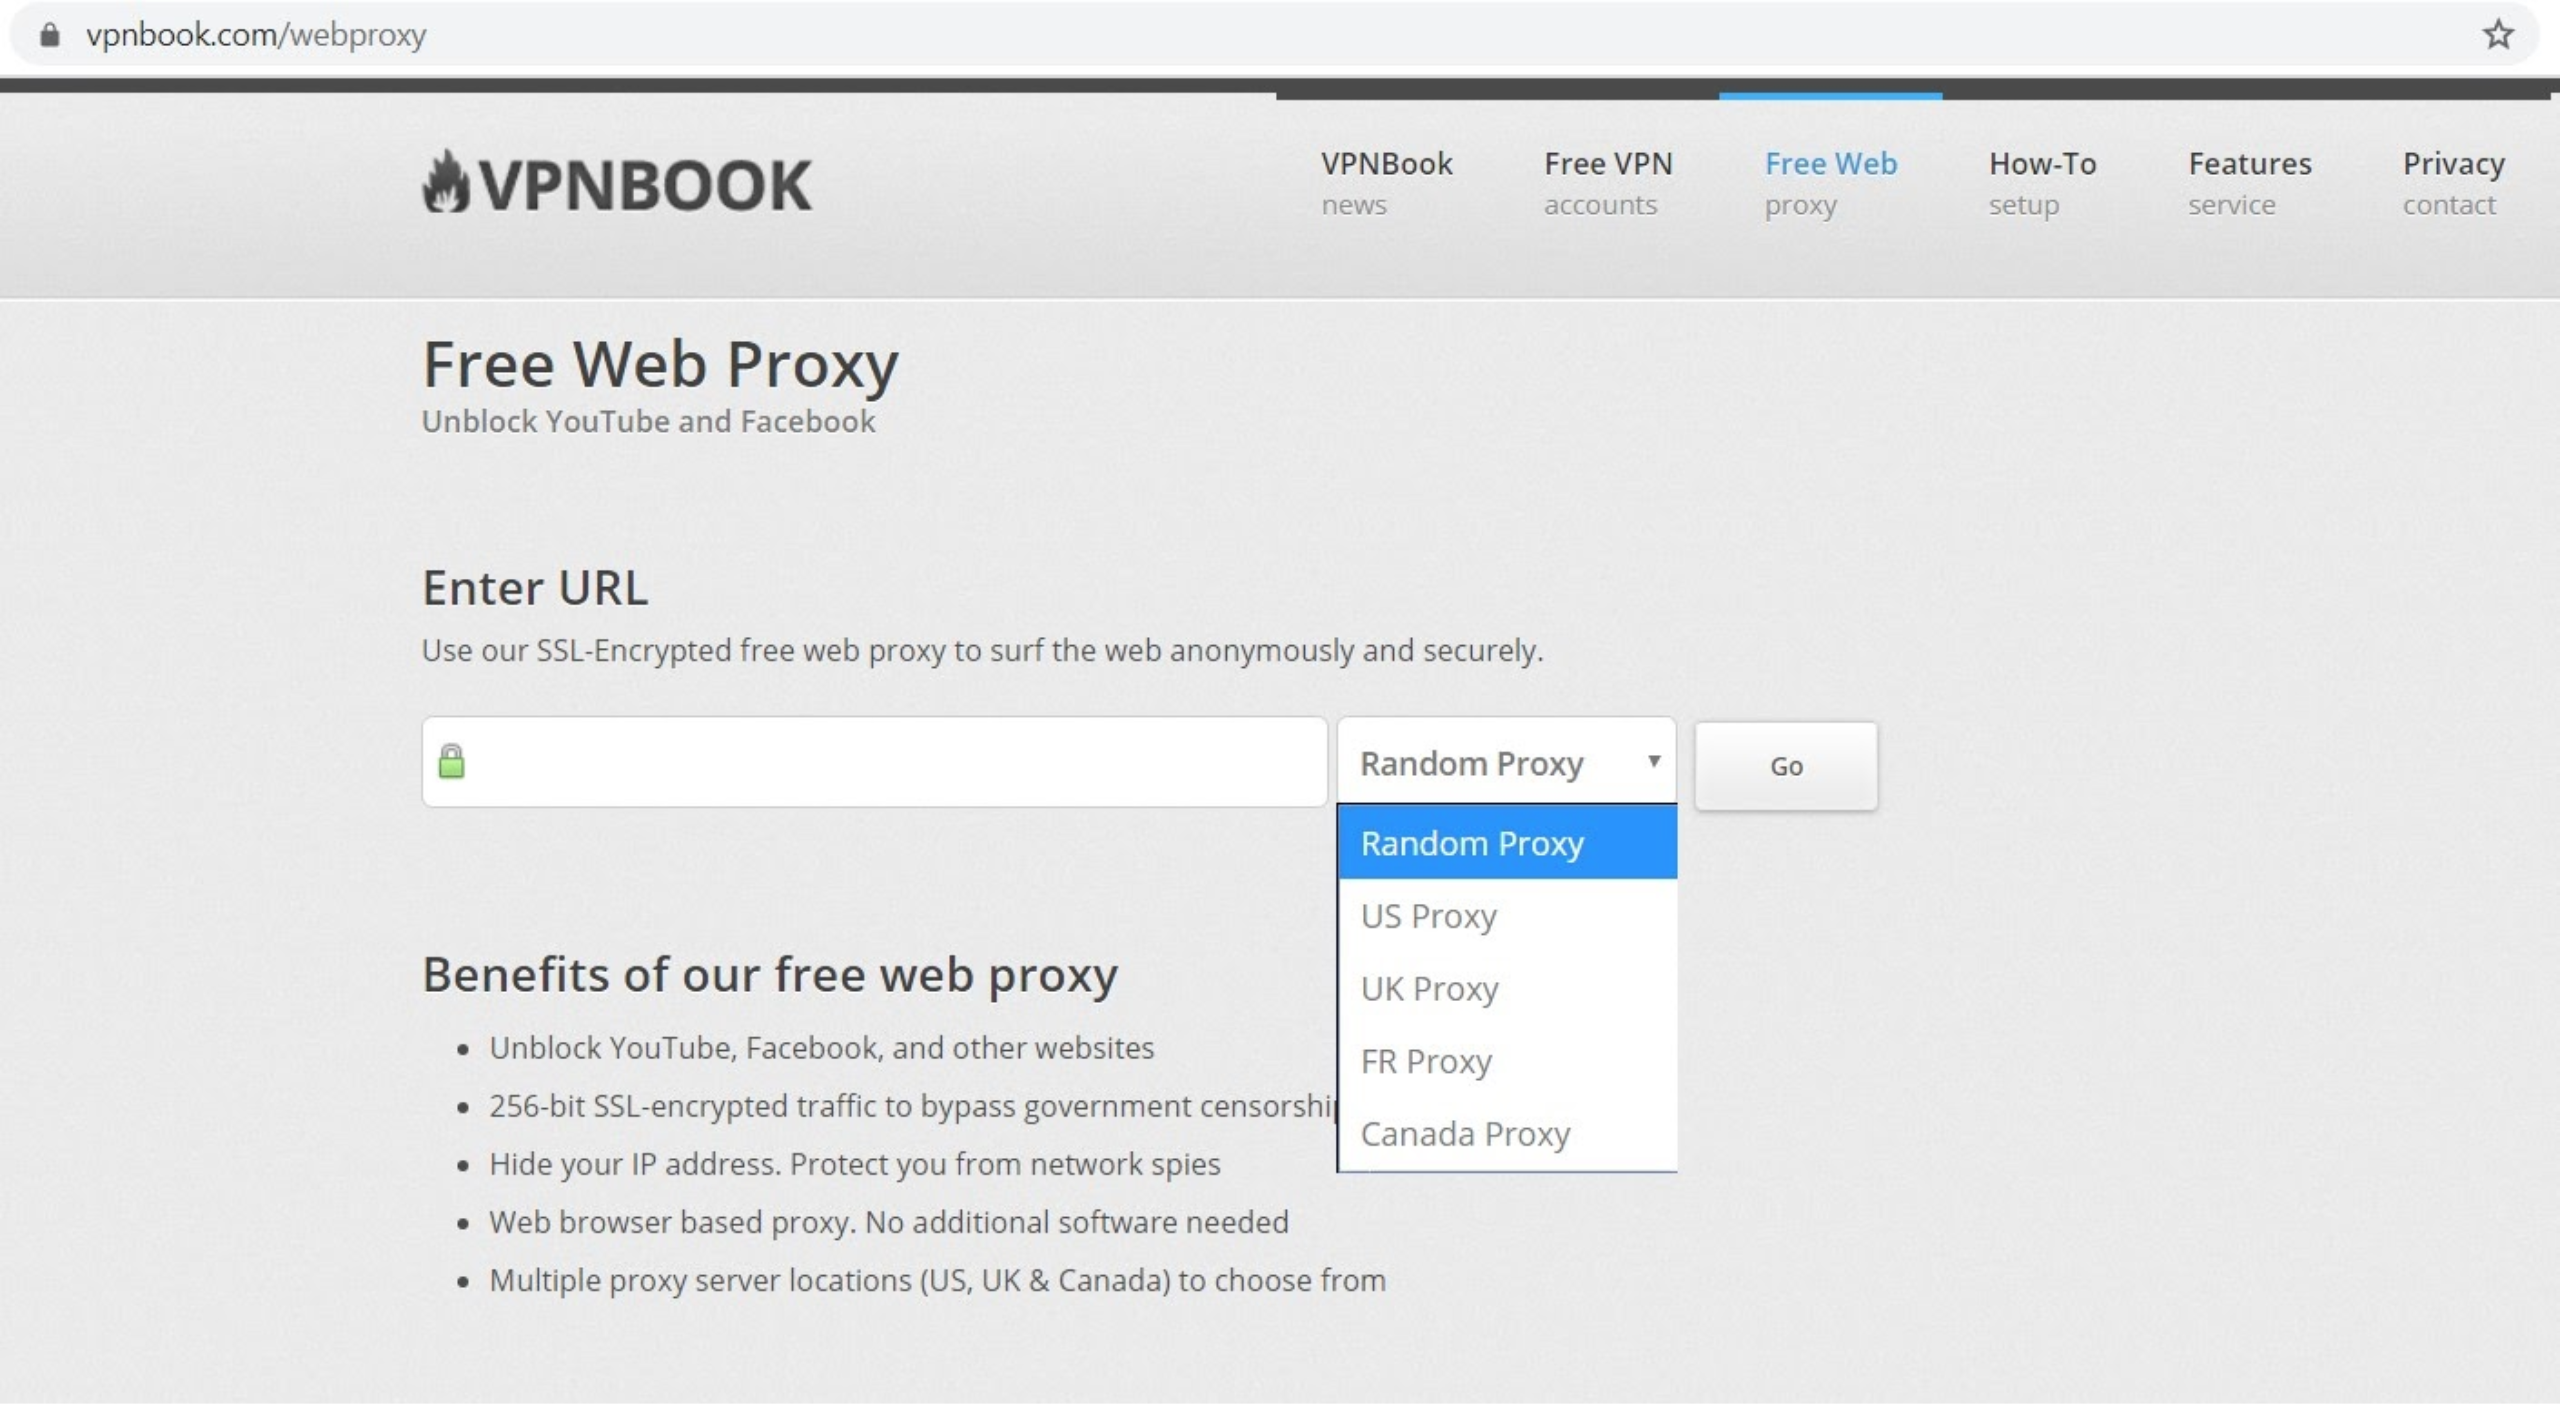 Screenshot of VPNBook landing page